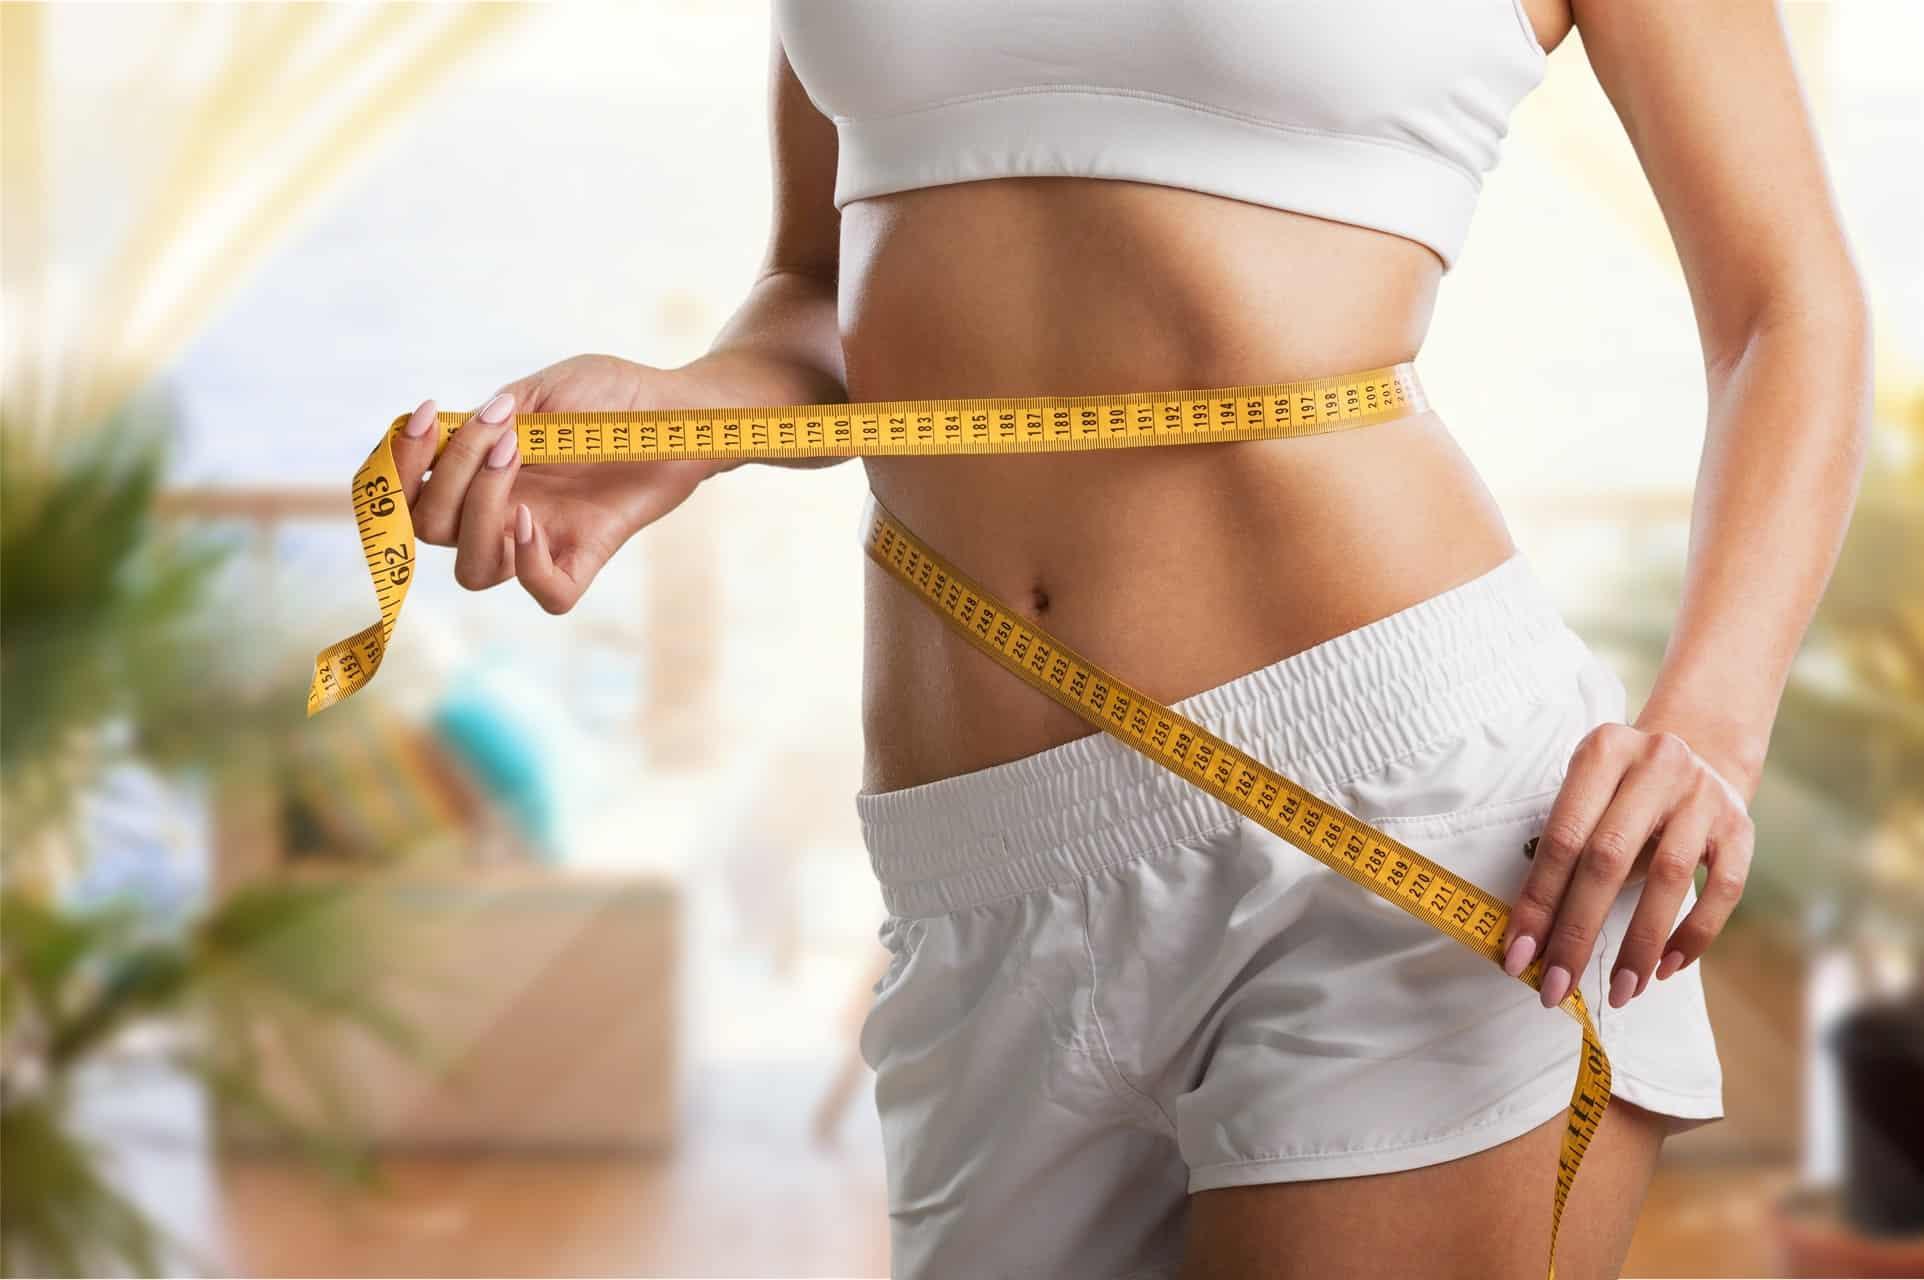 C:\Users\Zedex\Downloads\How-to-Lose-Weight-in-30-days-1.jpg